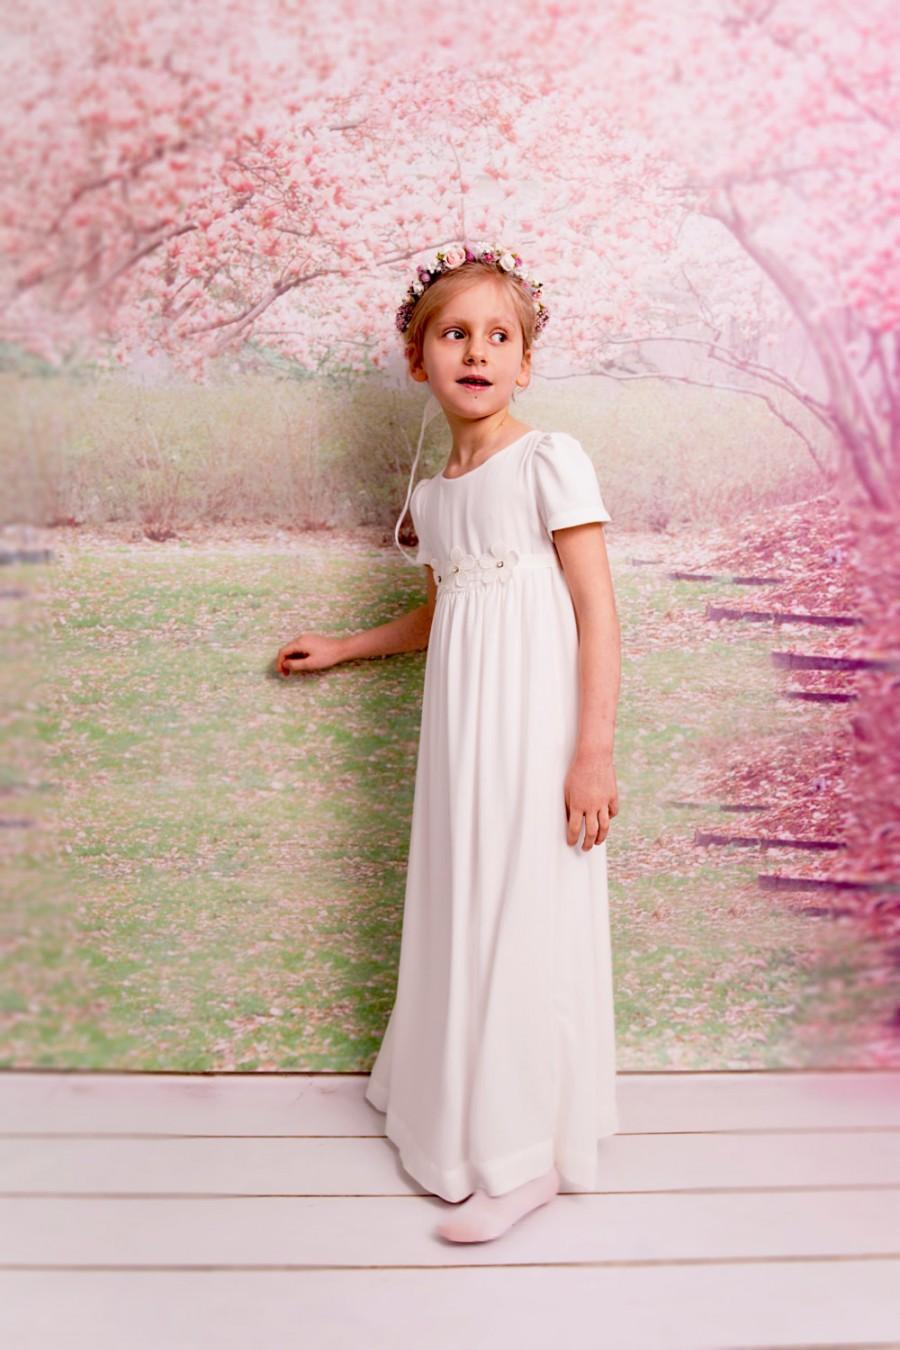 fb0450937 Junior bridesmaids dress Ivory girl dress Holy communion dress Flower girl  dress Baptism dress Christening girl dress First communion dress